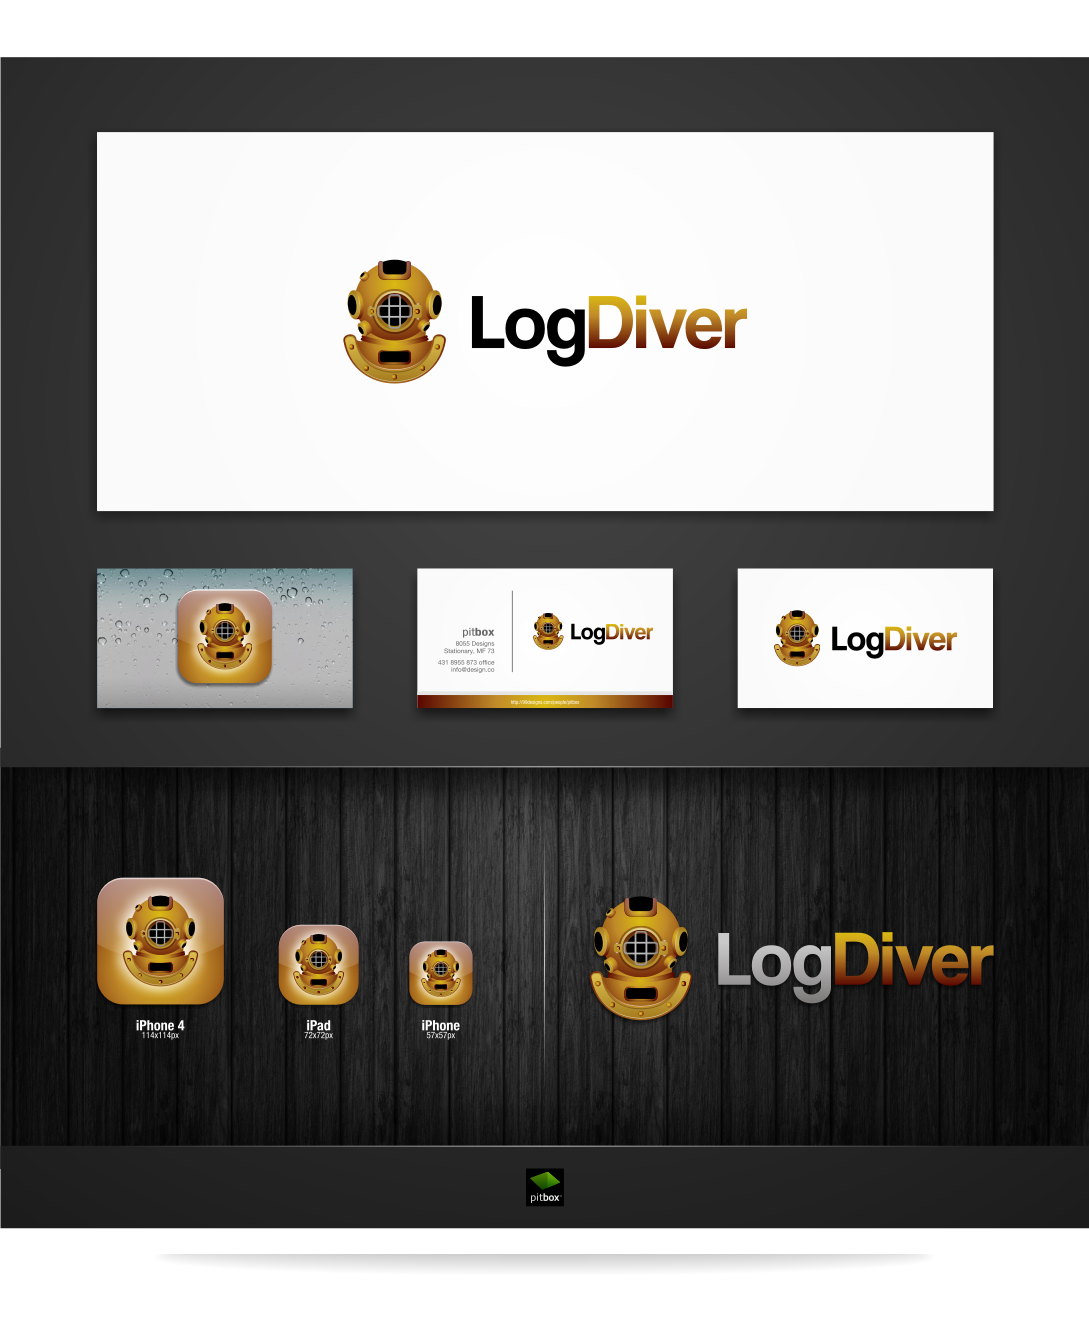 Log Diver application needs a striking logo